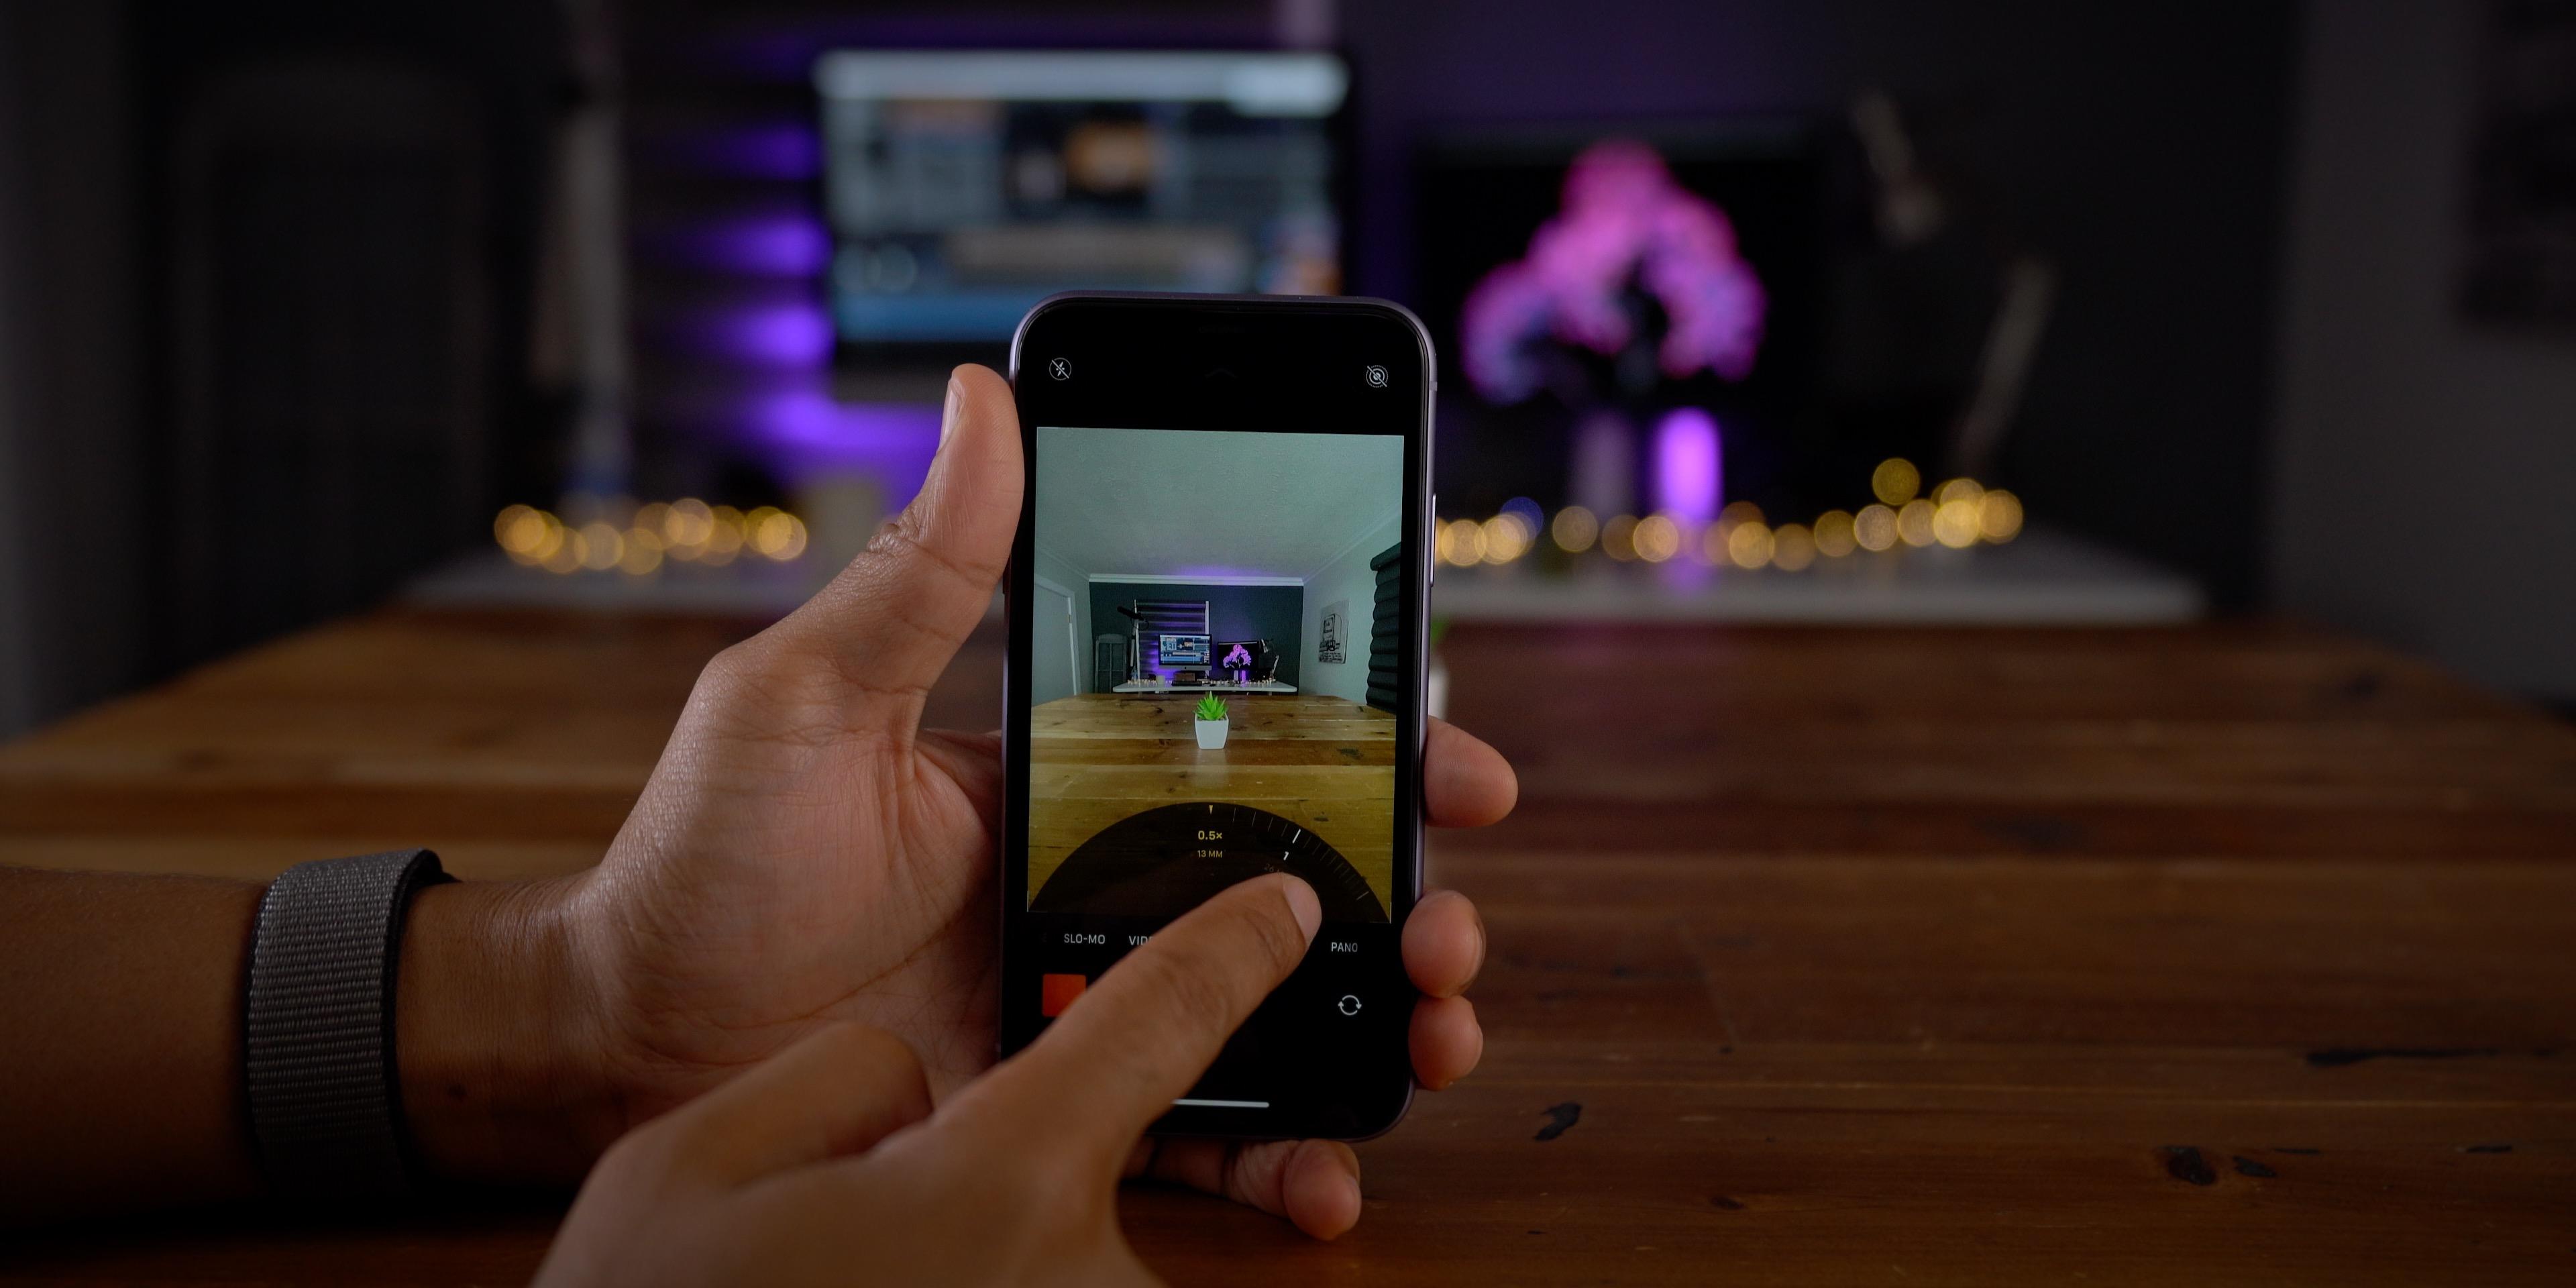 New stock Camera app zooming